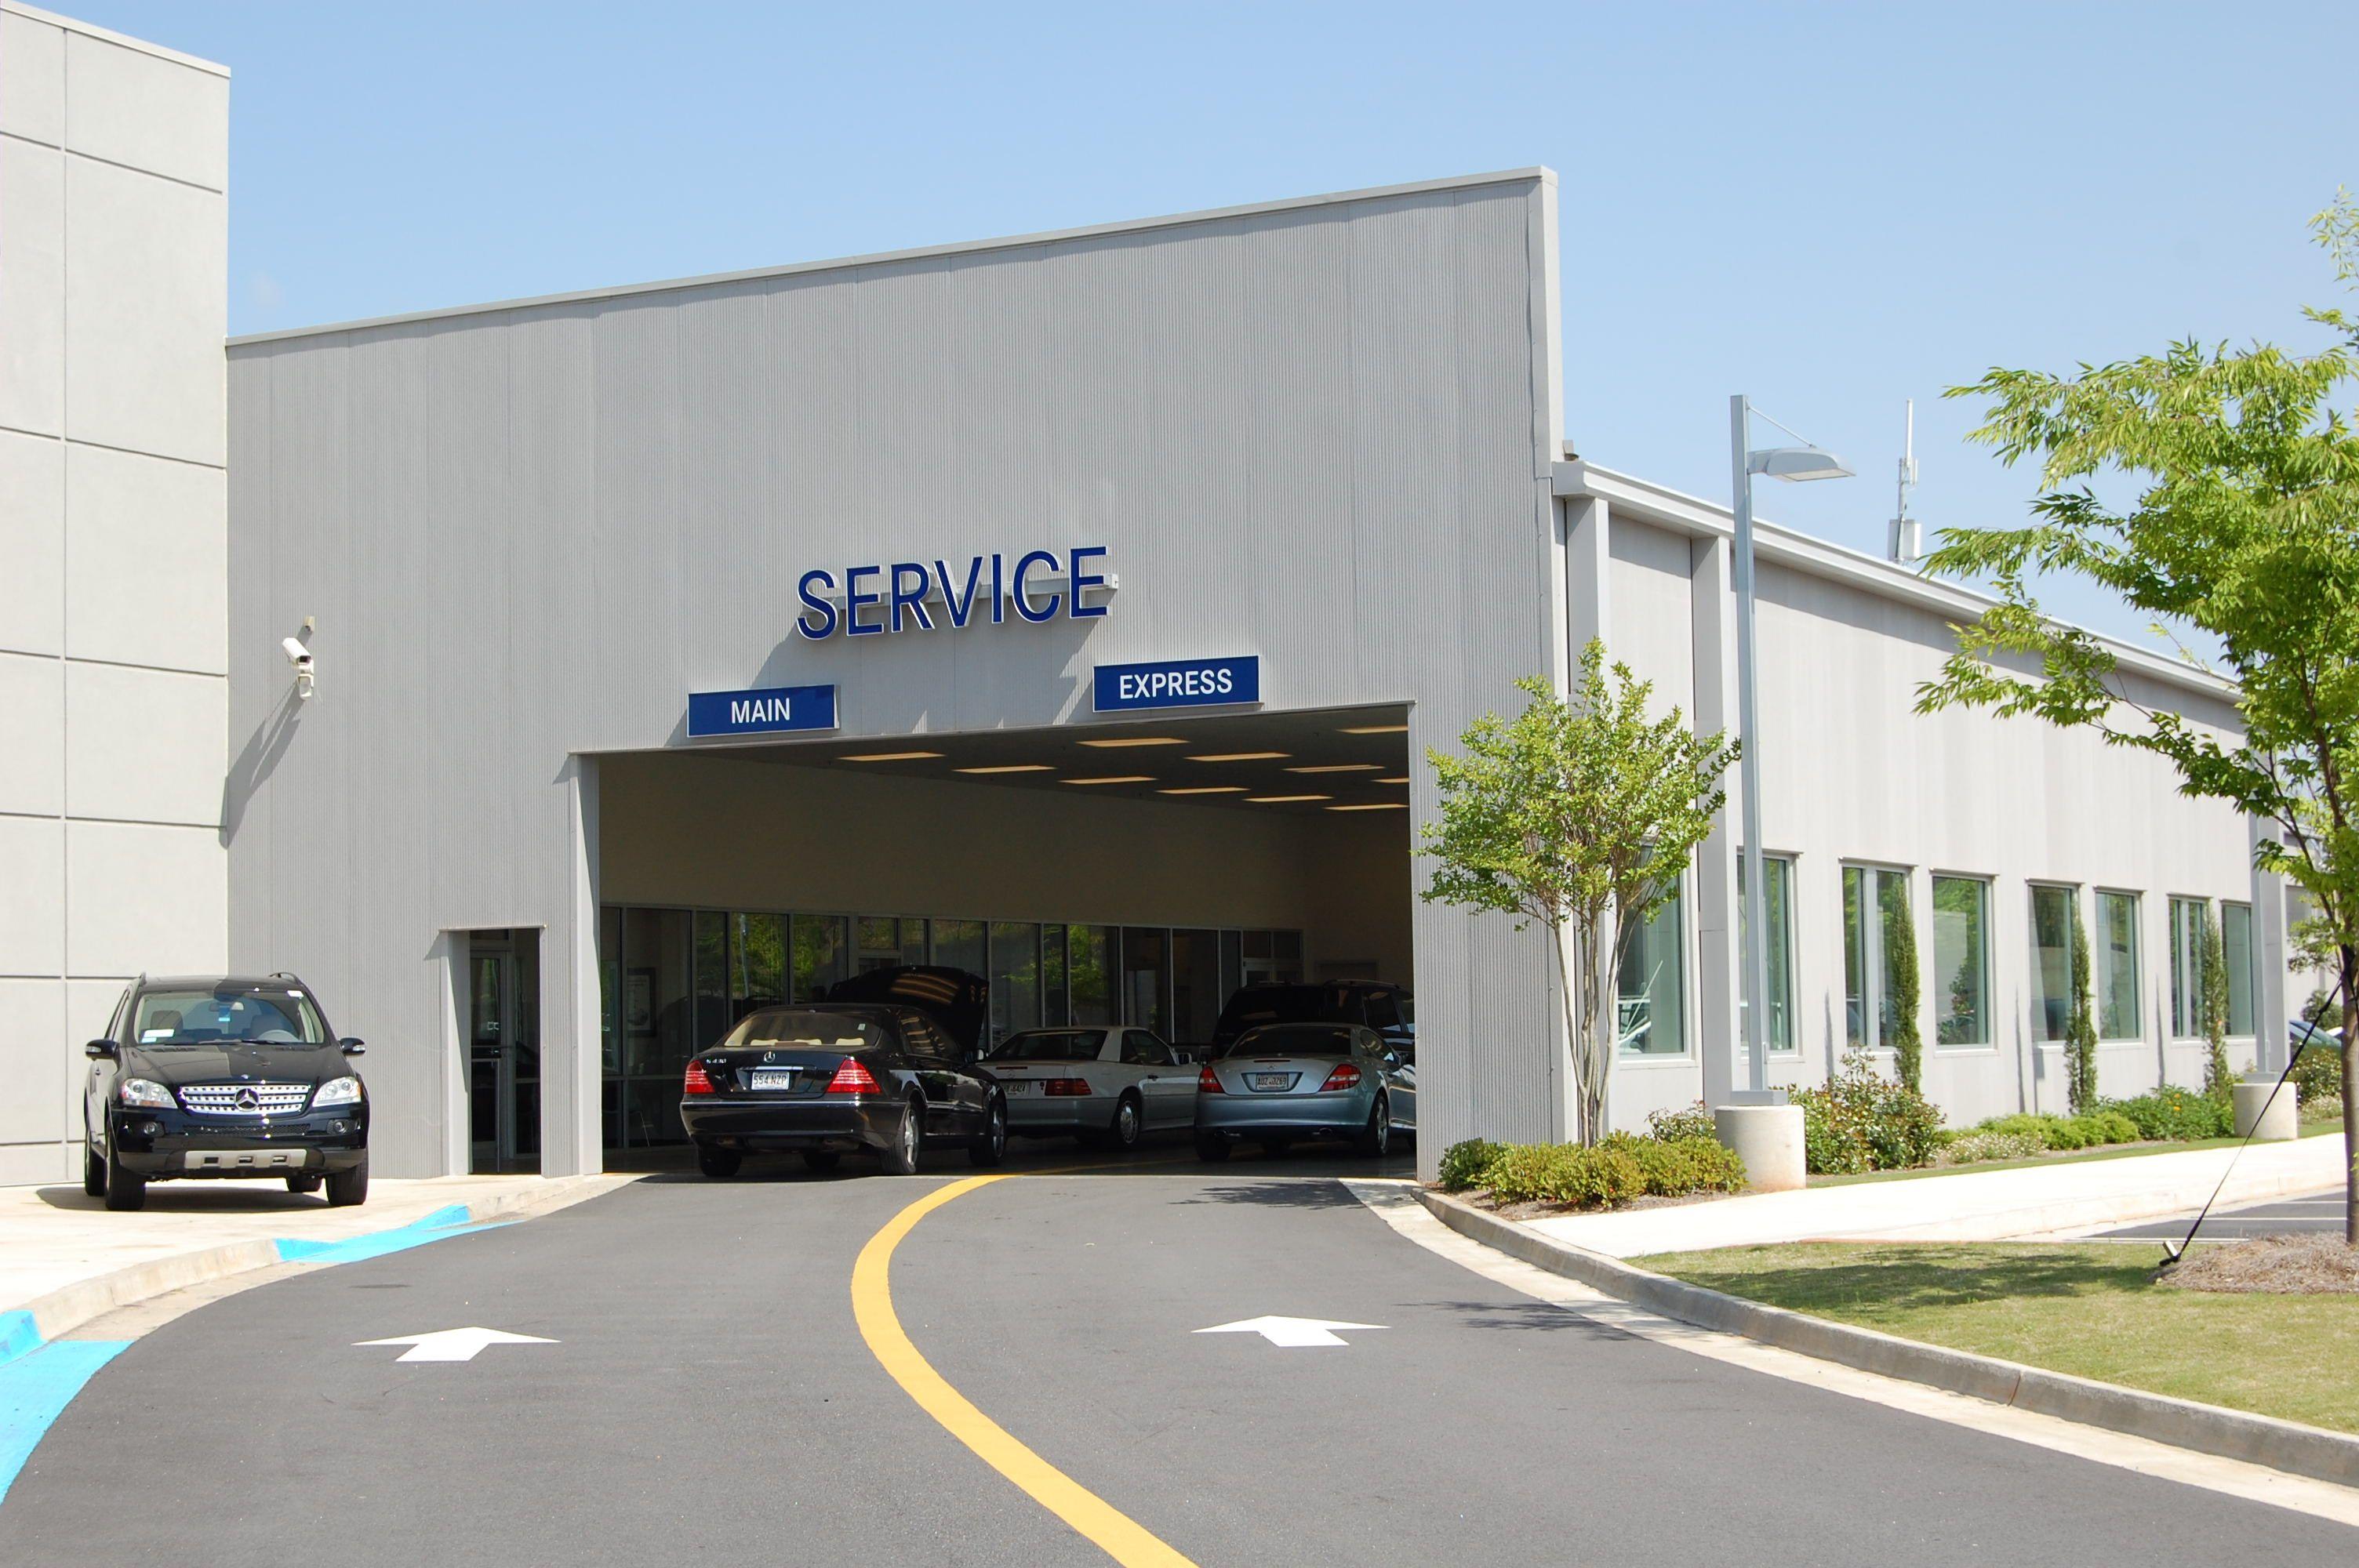 Rbm Of Atlanta North Service Drive Rbmnorth New And Used Cars Used Car Dealer